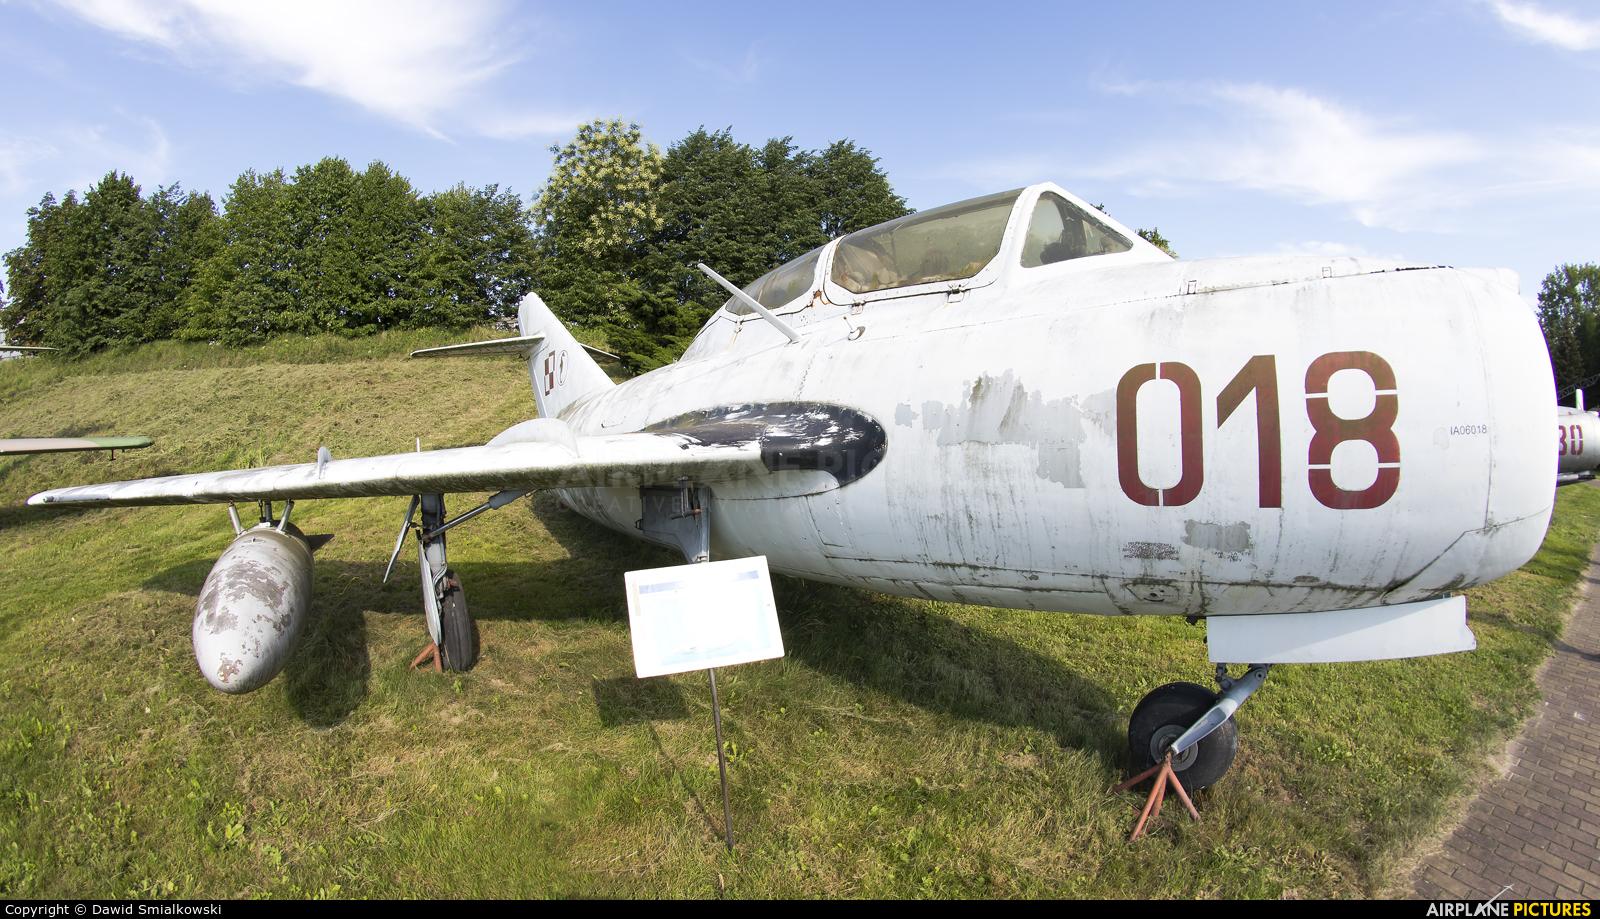 Poland - Navy 018 aircraft at Kraków, Rakowice Czyżyny - Museum of Polish Aviation